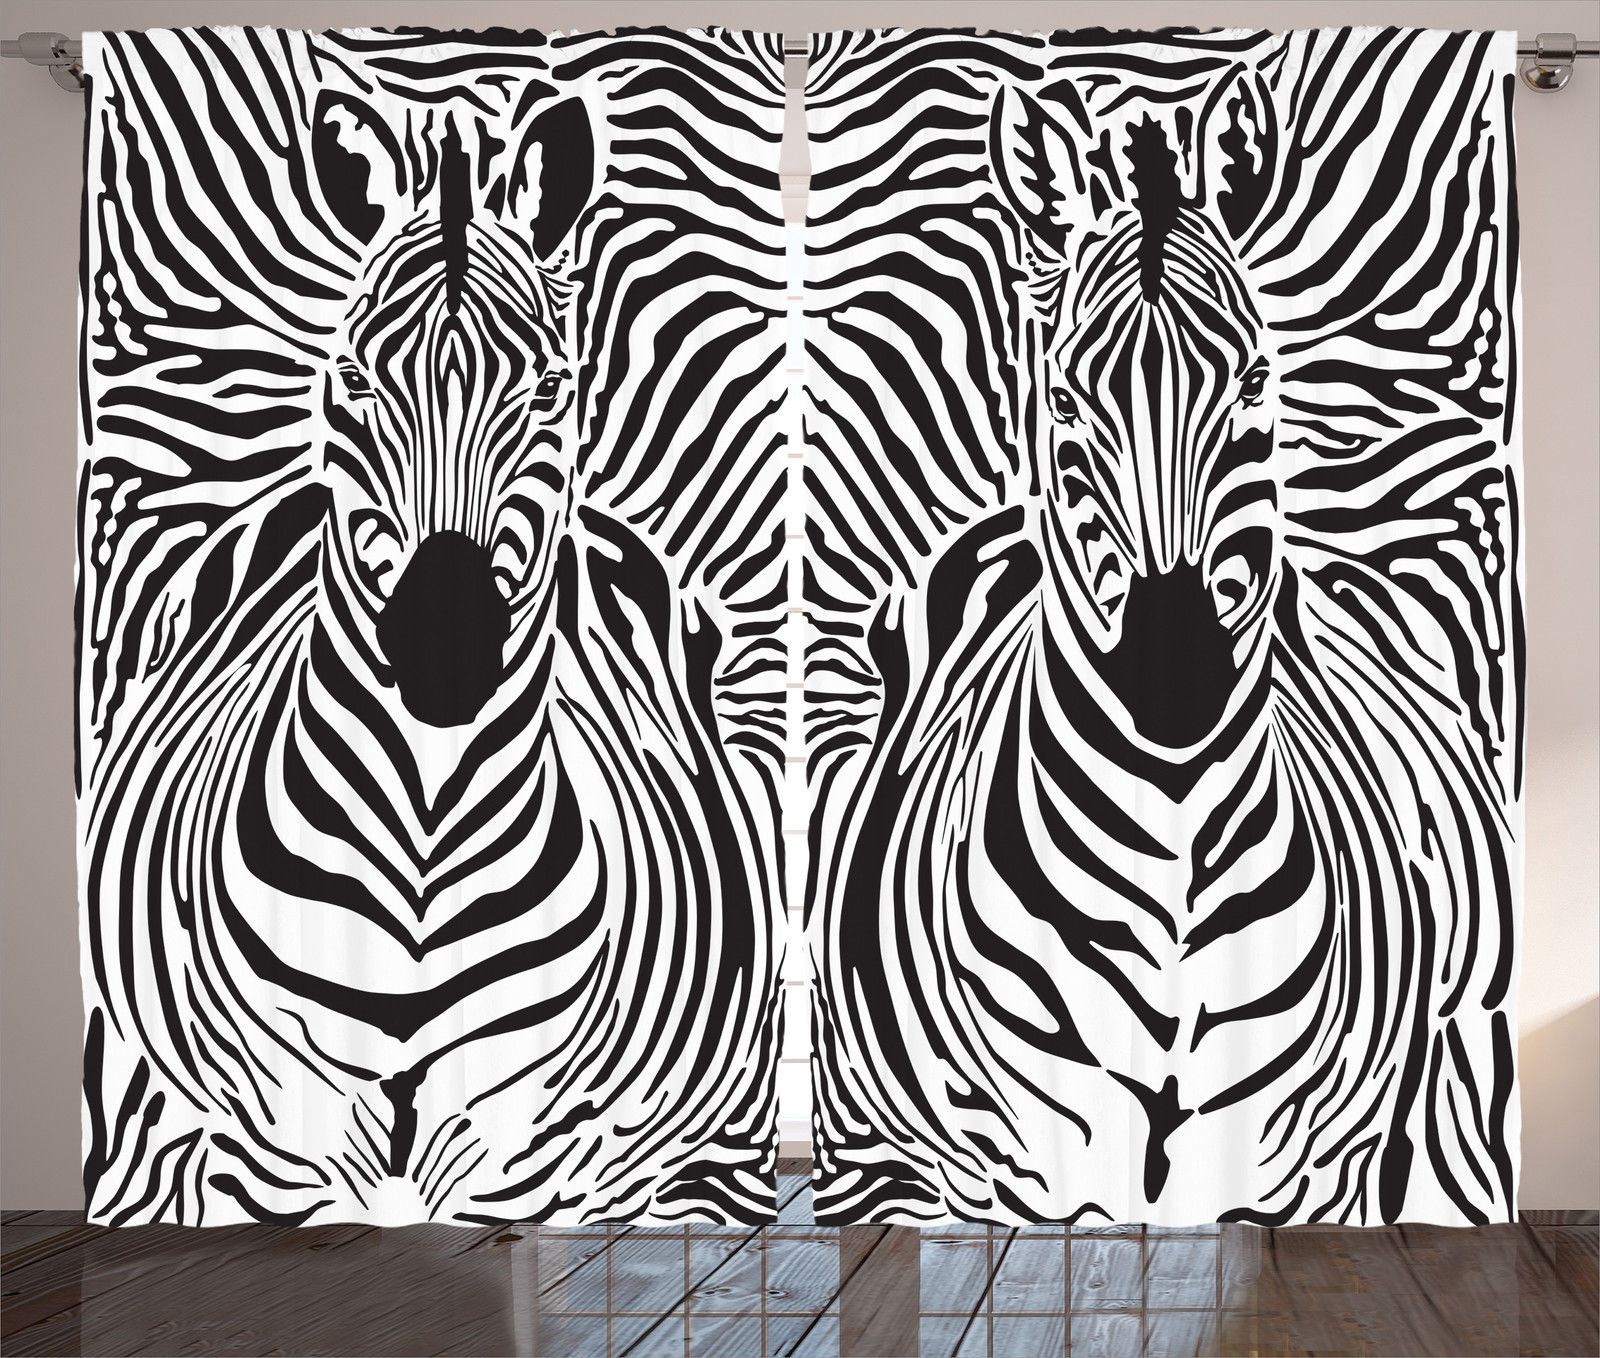 Zebra window curtains - Zebra Window Curtains Black White Animal Print 2